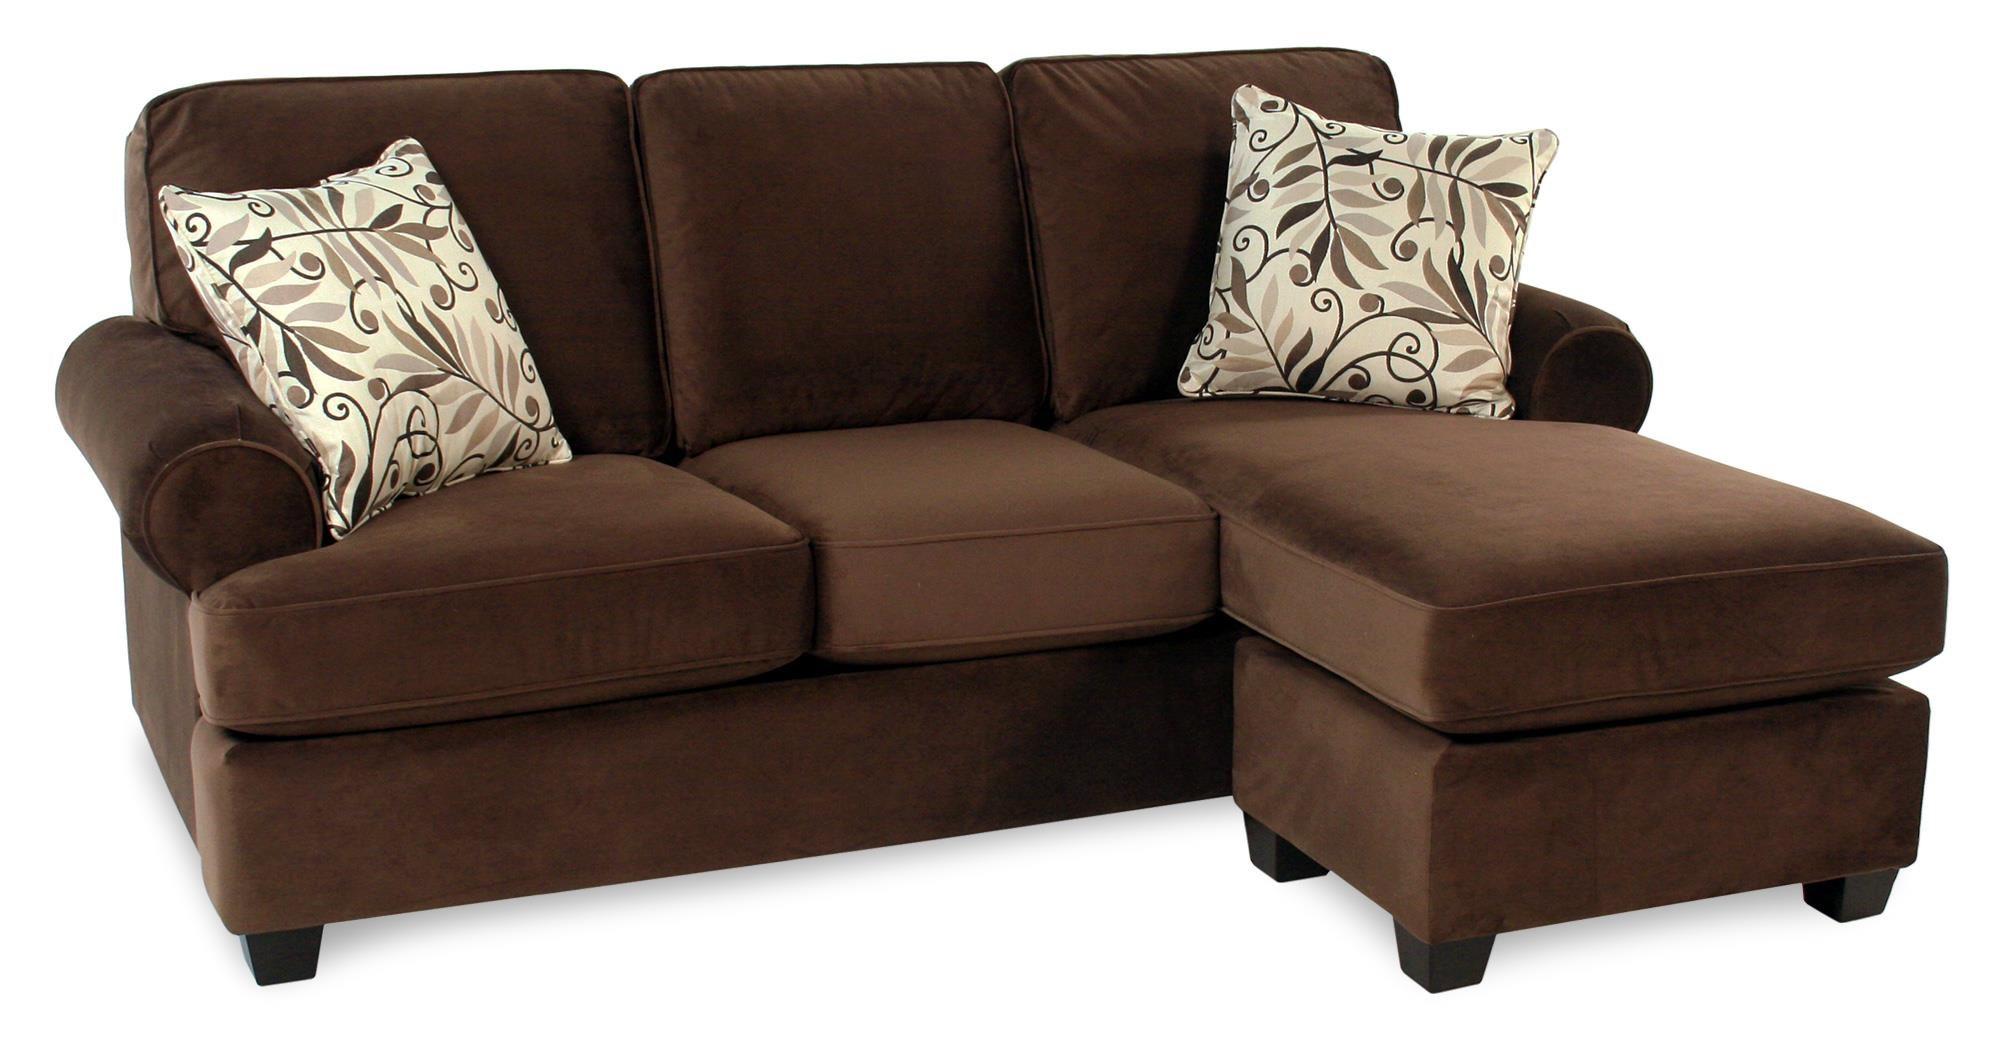 Sofa w/ Reversible Chaise